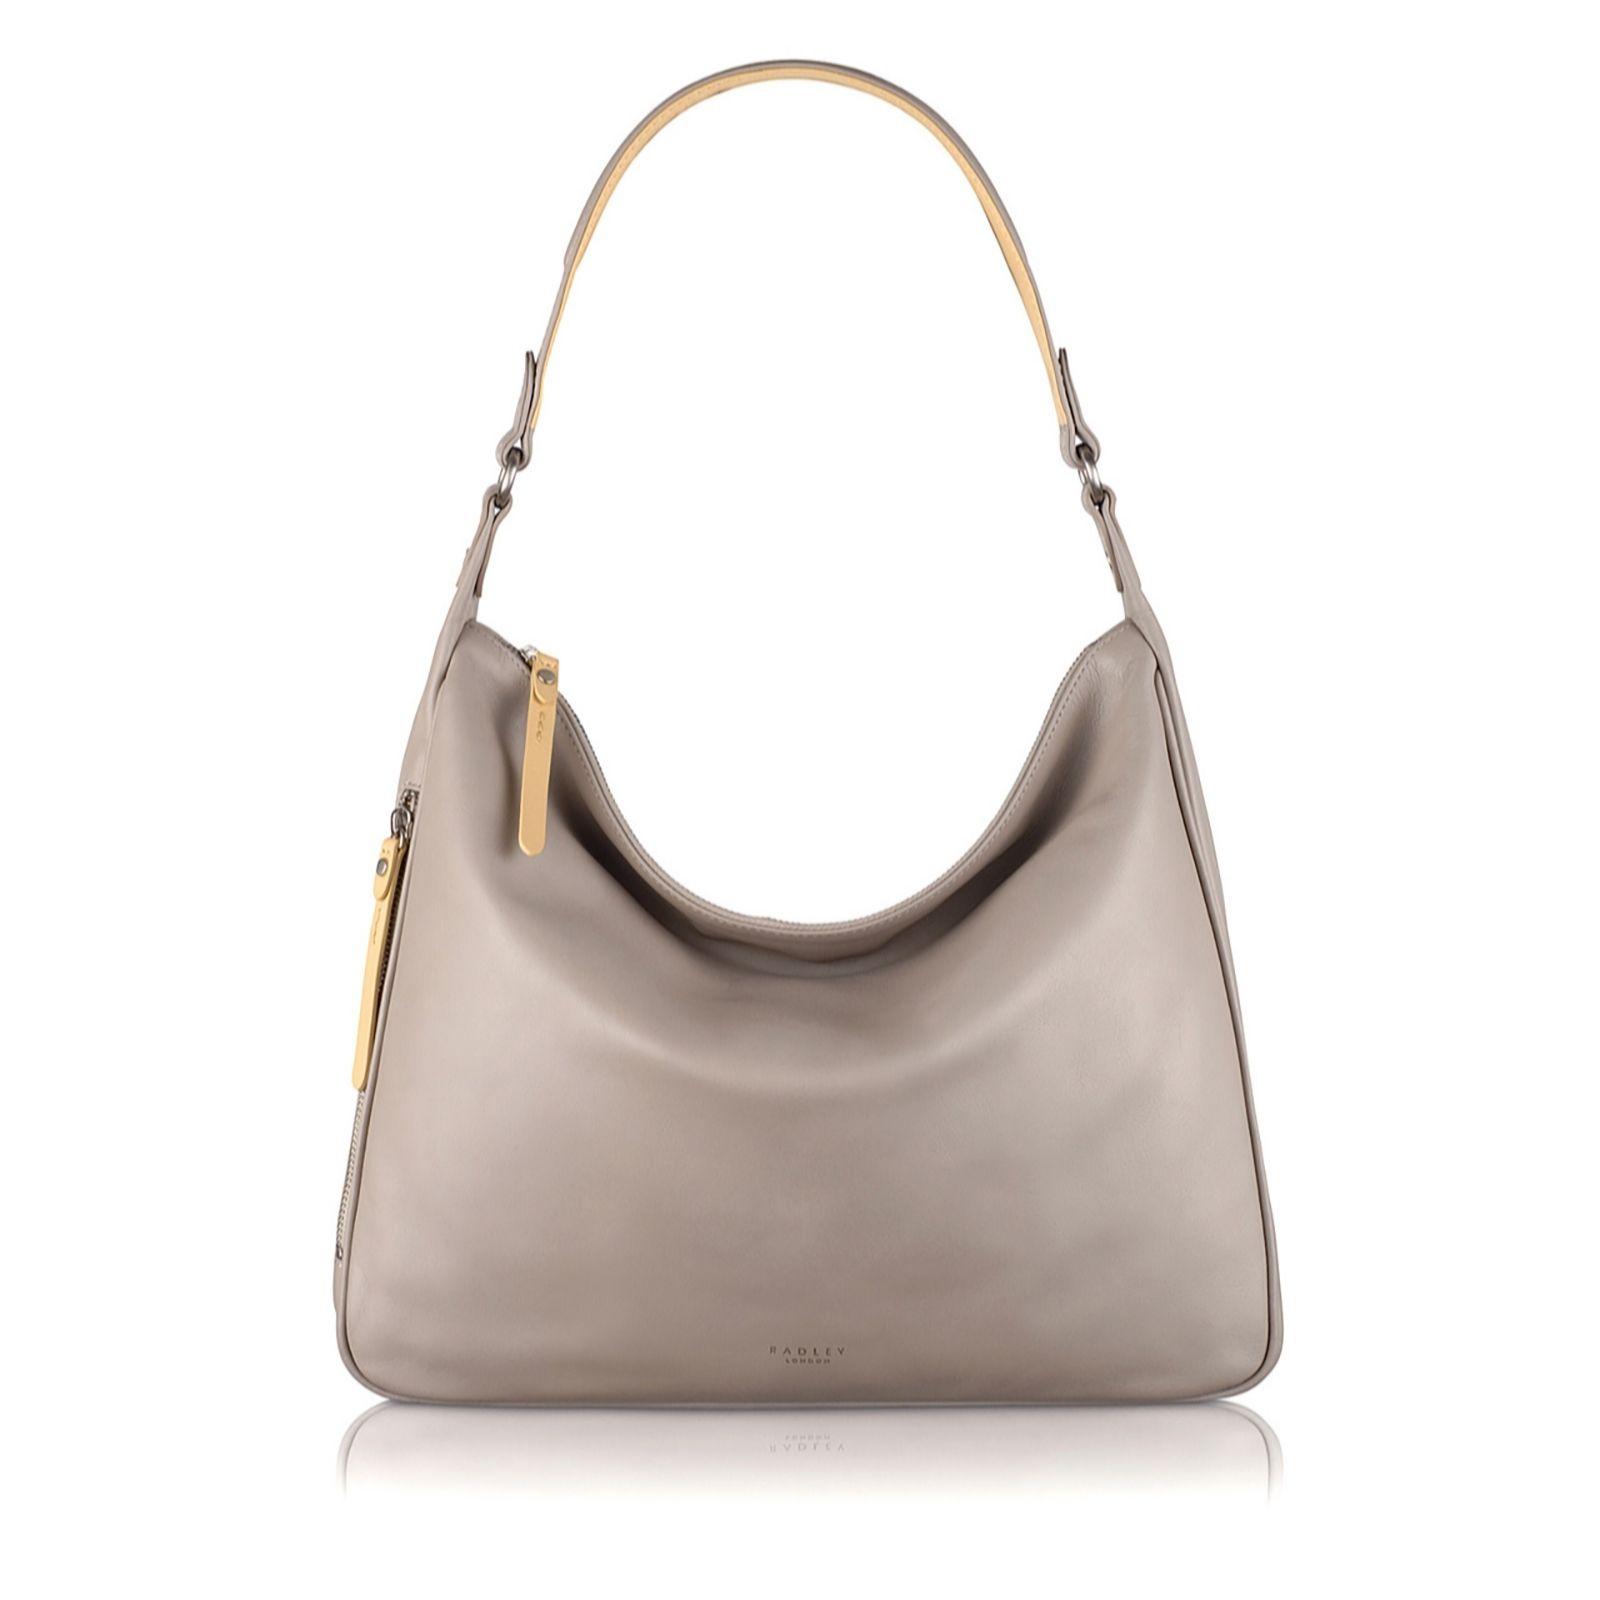 Radley London Frith Street Large Zip Top Hobo Bag - Page 1 - QVC UK